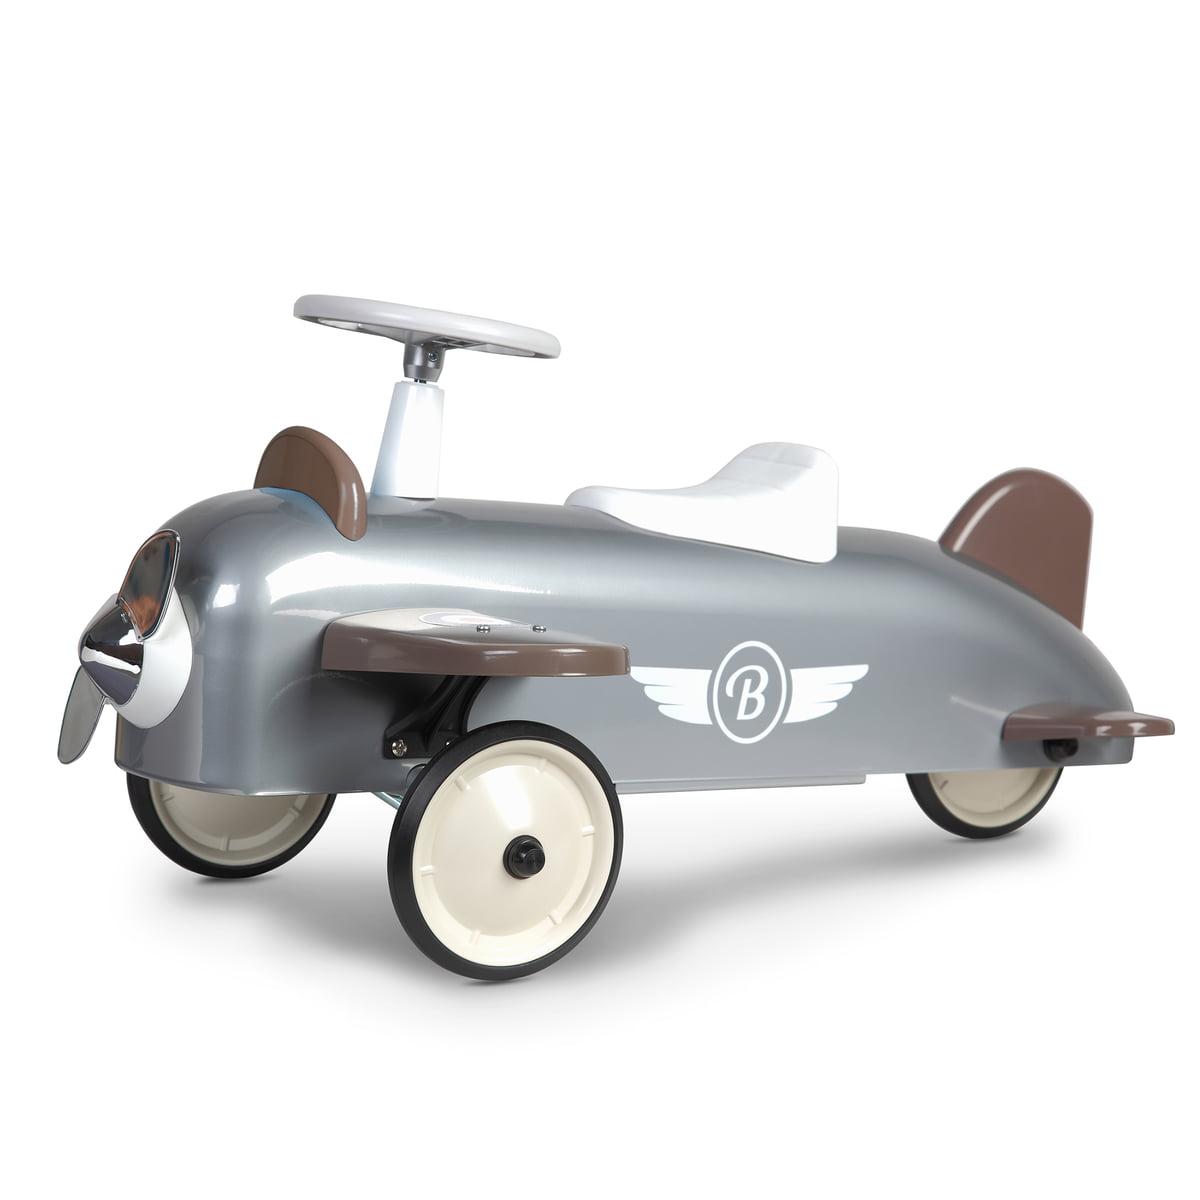 Speedster, Flugzeug